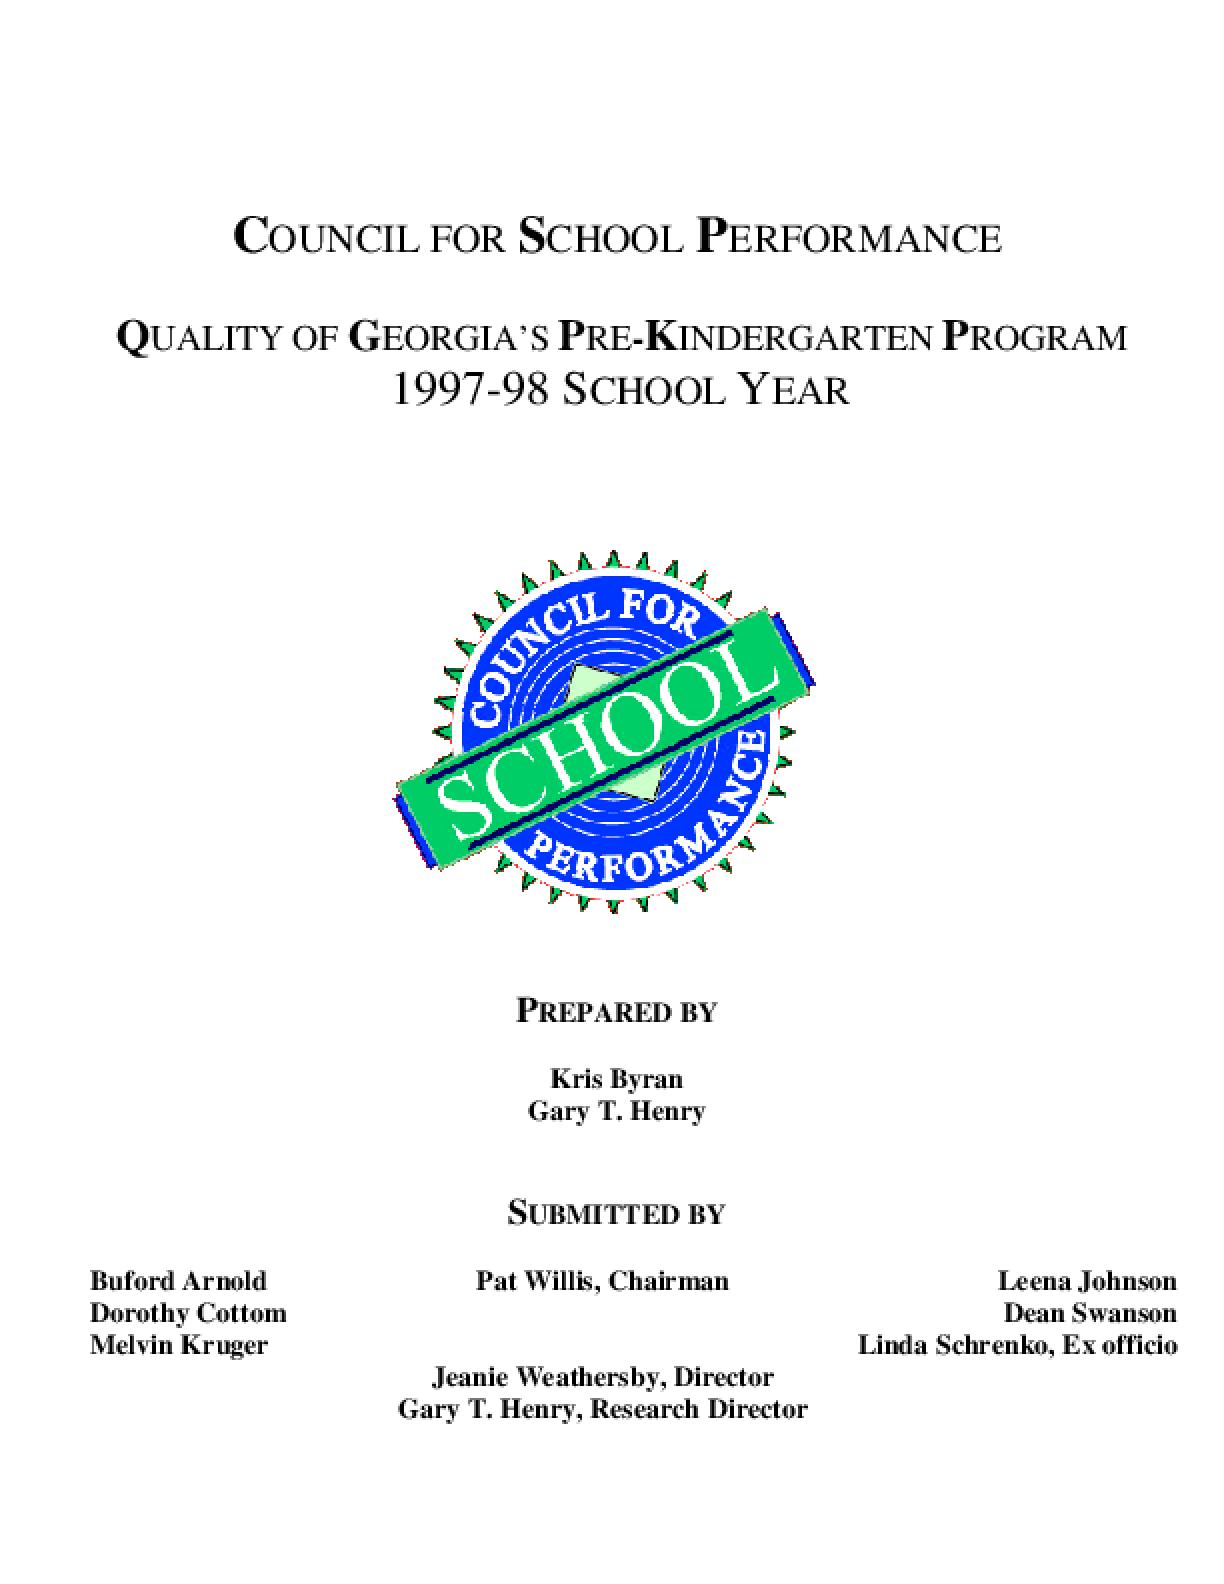 Quality of Georgia's Pre-Kindergarten Program, 1997-98 School Year